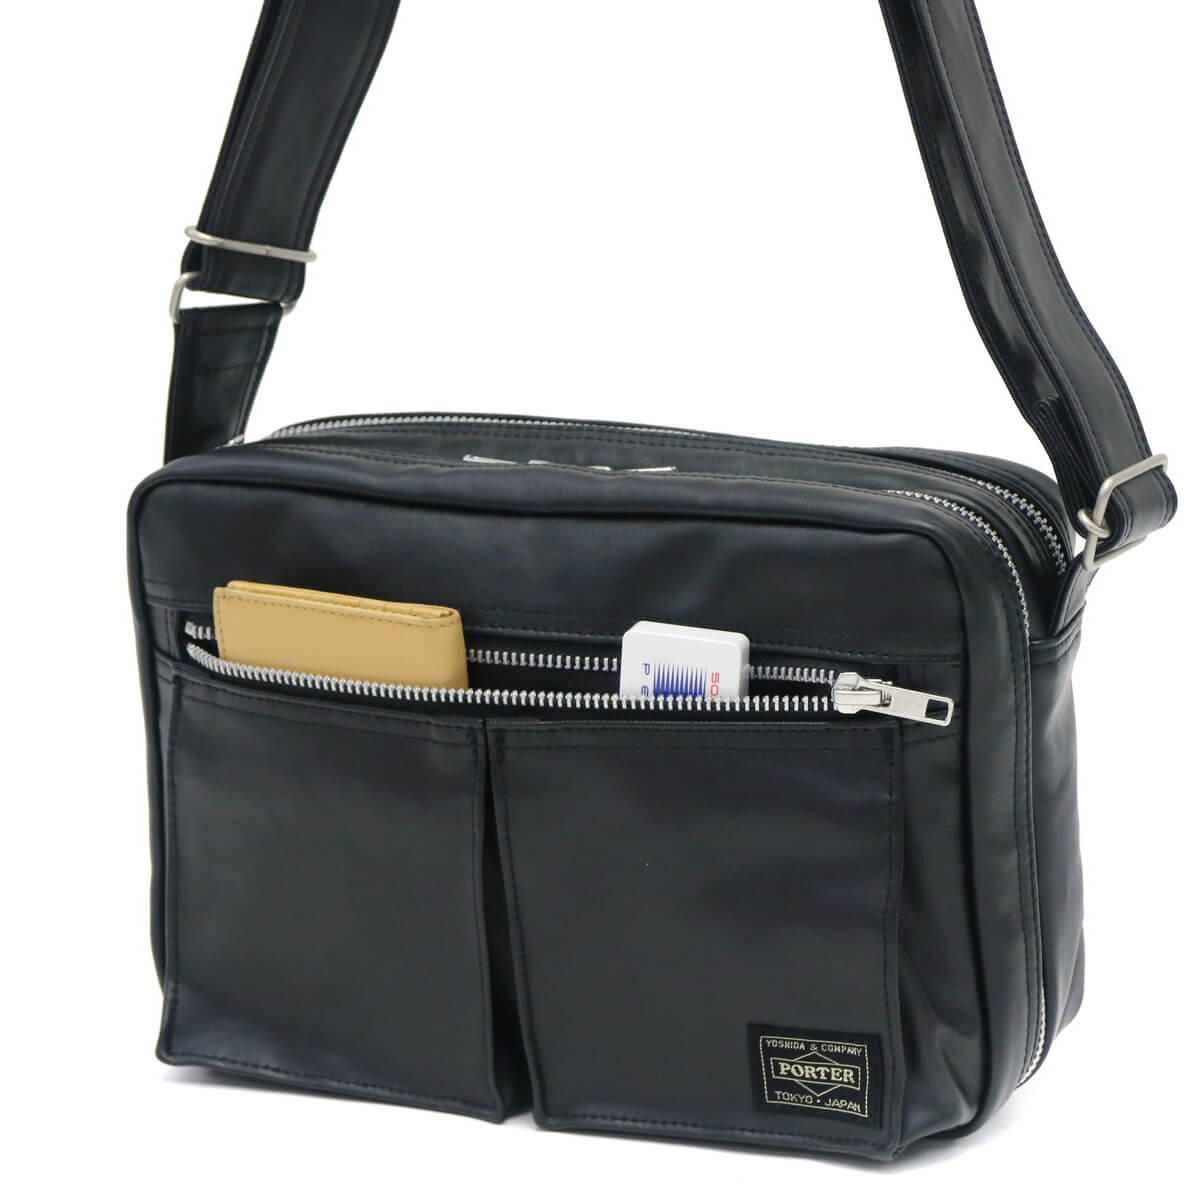 ebdbe11af4a ... Yoshida bags Porter freestyle shoulder bag (S) PORTER FREE STYLE  diagonally smaller size men's ...